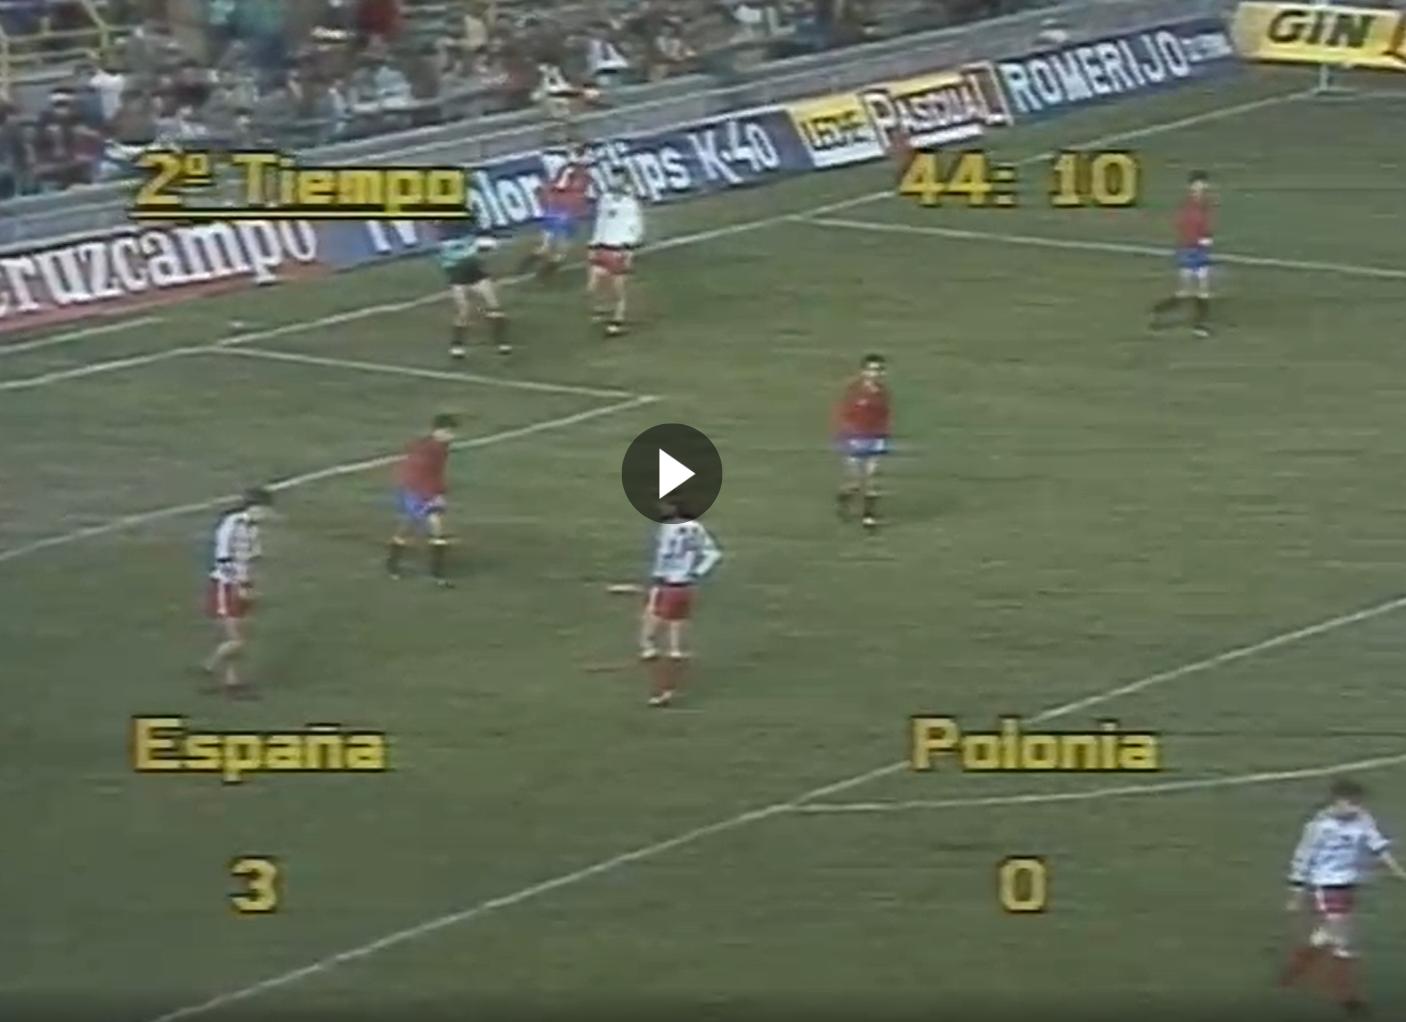 Hiszpania - Polska 1986